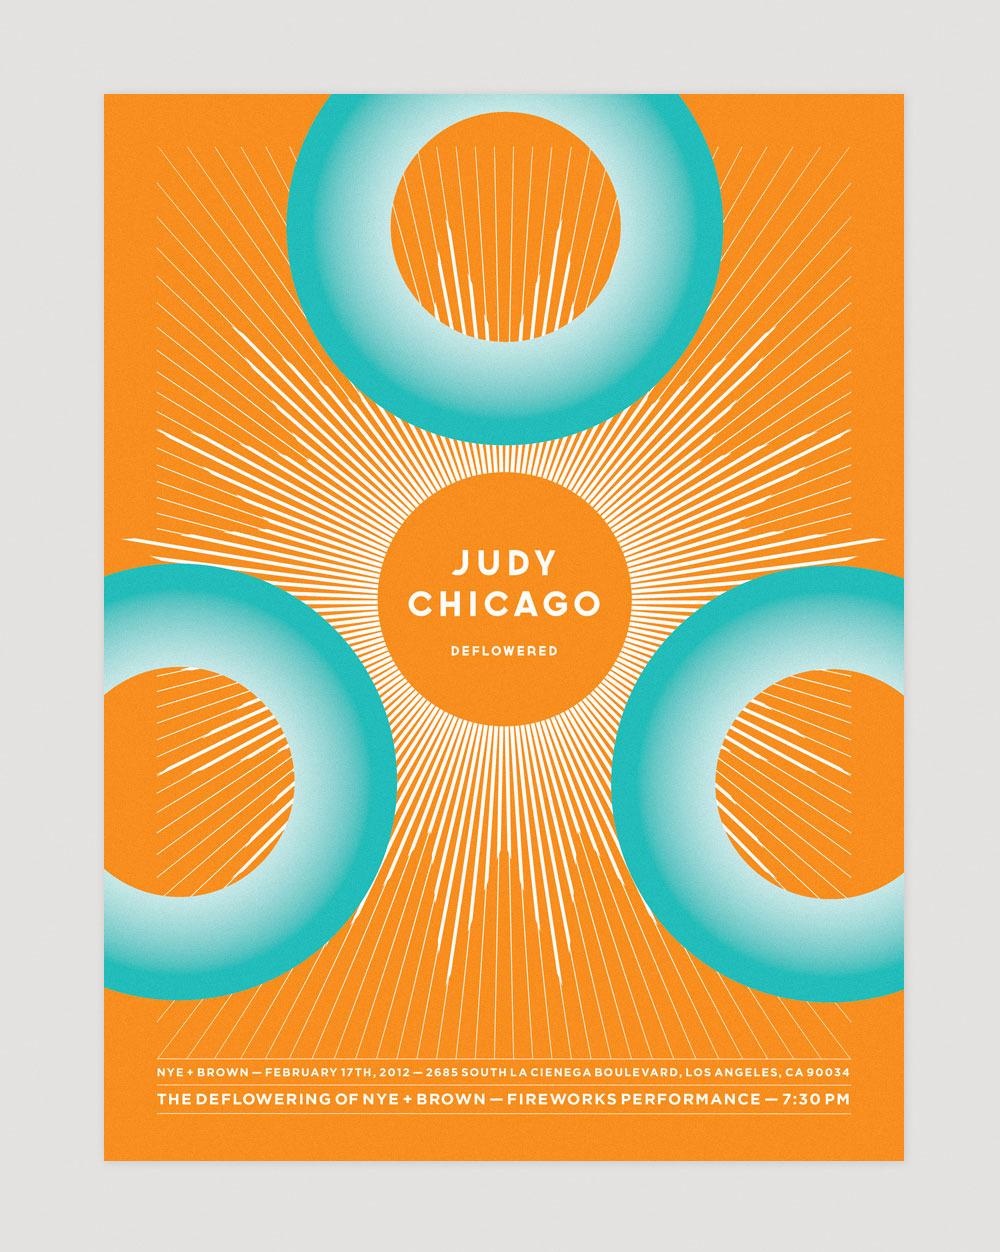 Judy Chicago — Deflowered - Kyle LaMar